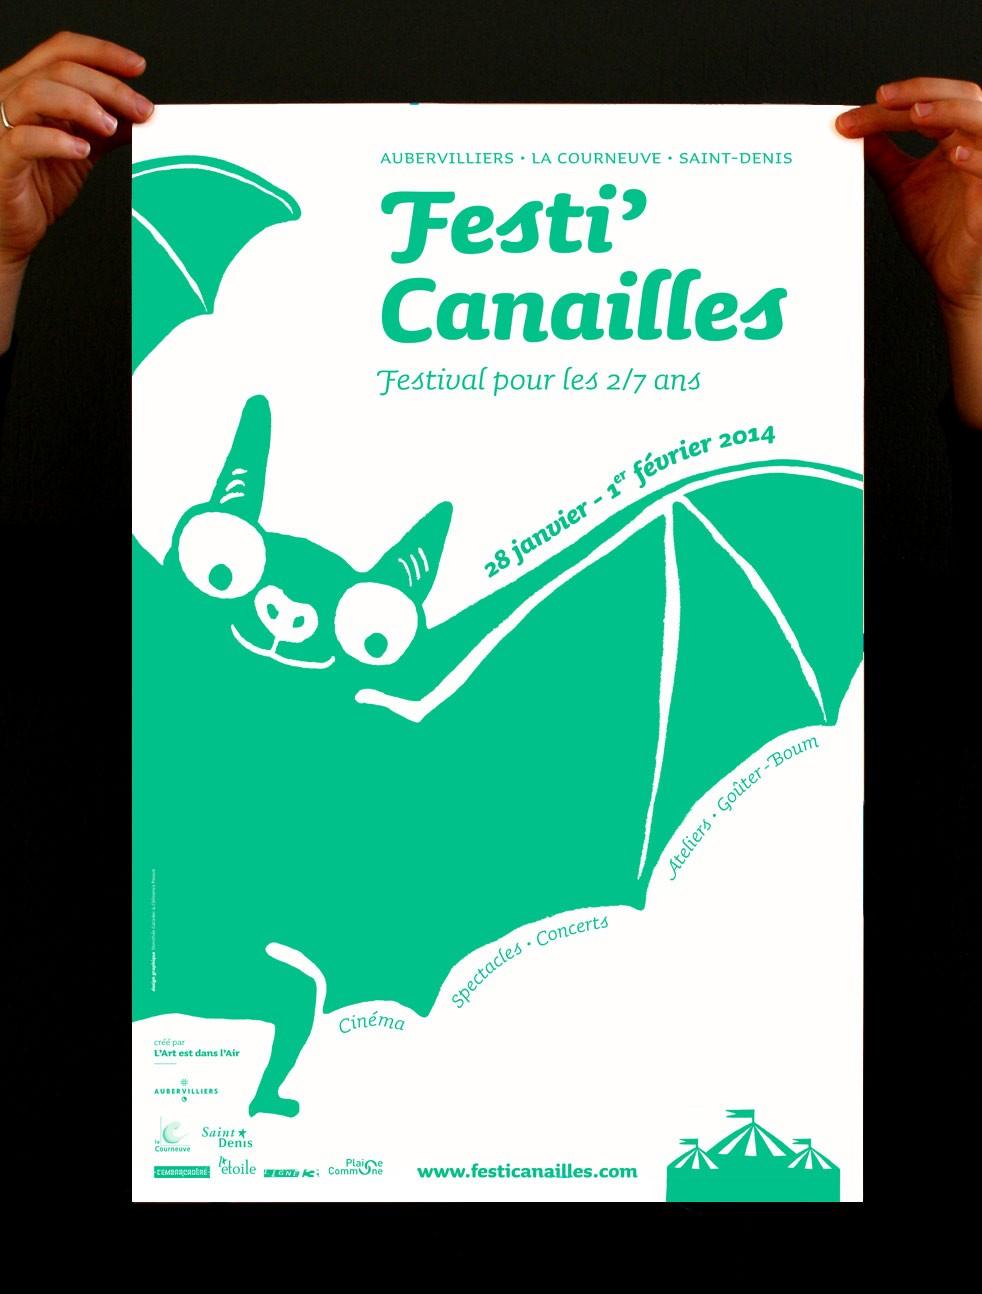 festi-canailles_2012-2014_08-782a441386a58d7b1838ca7b5e974fb2